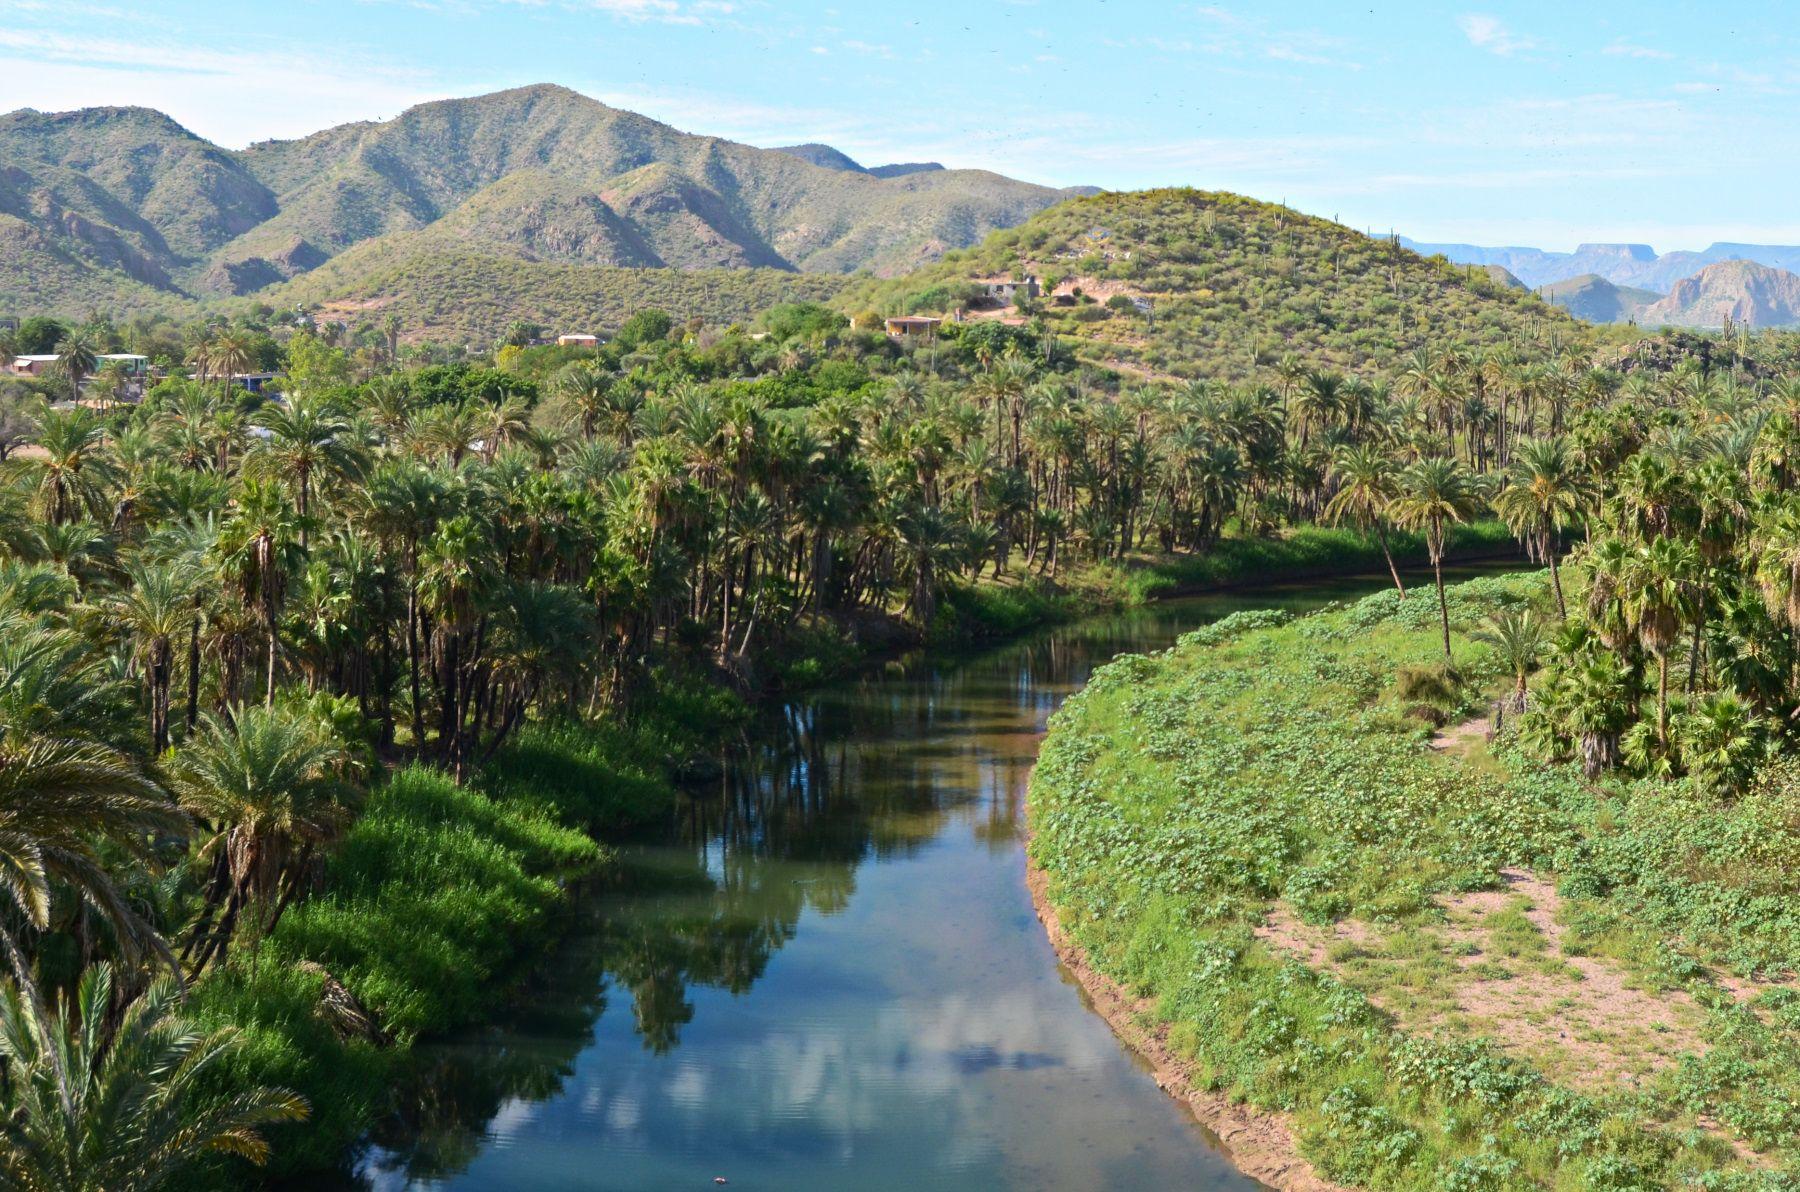 Heroica Mulege - a beautiful oasis village in Baja California Sur, Mexico